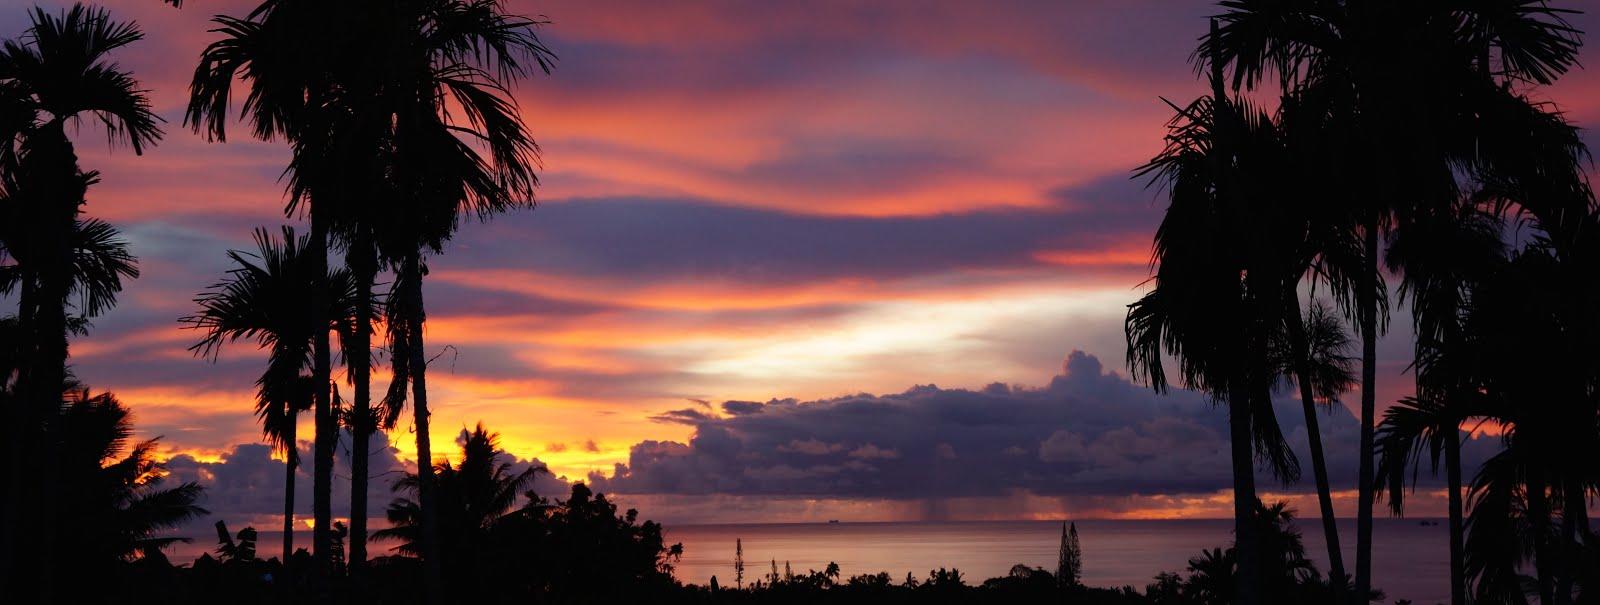 Sunset in Palau